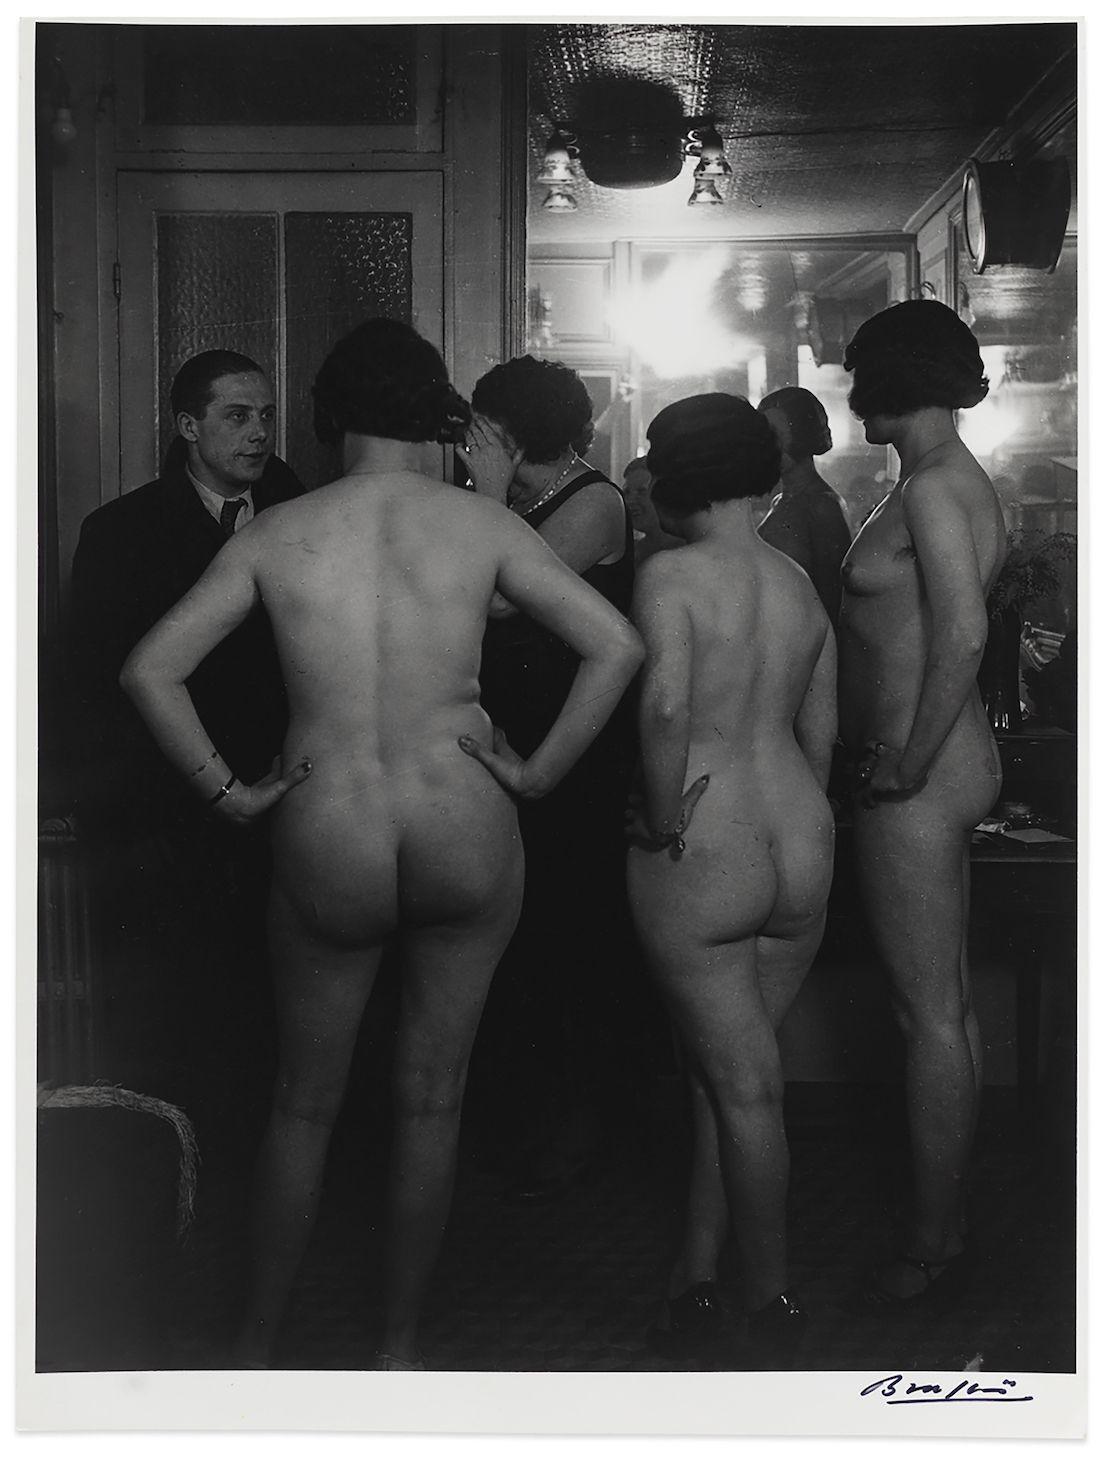 Brassaï, Chez Suzy, la presentation (At Suzy's, introductions) (around 1932-33)